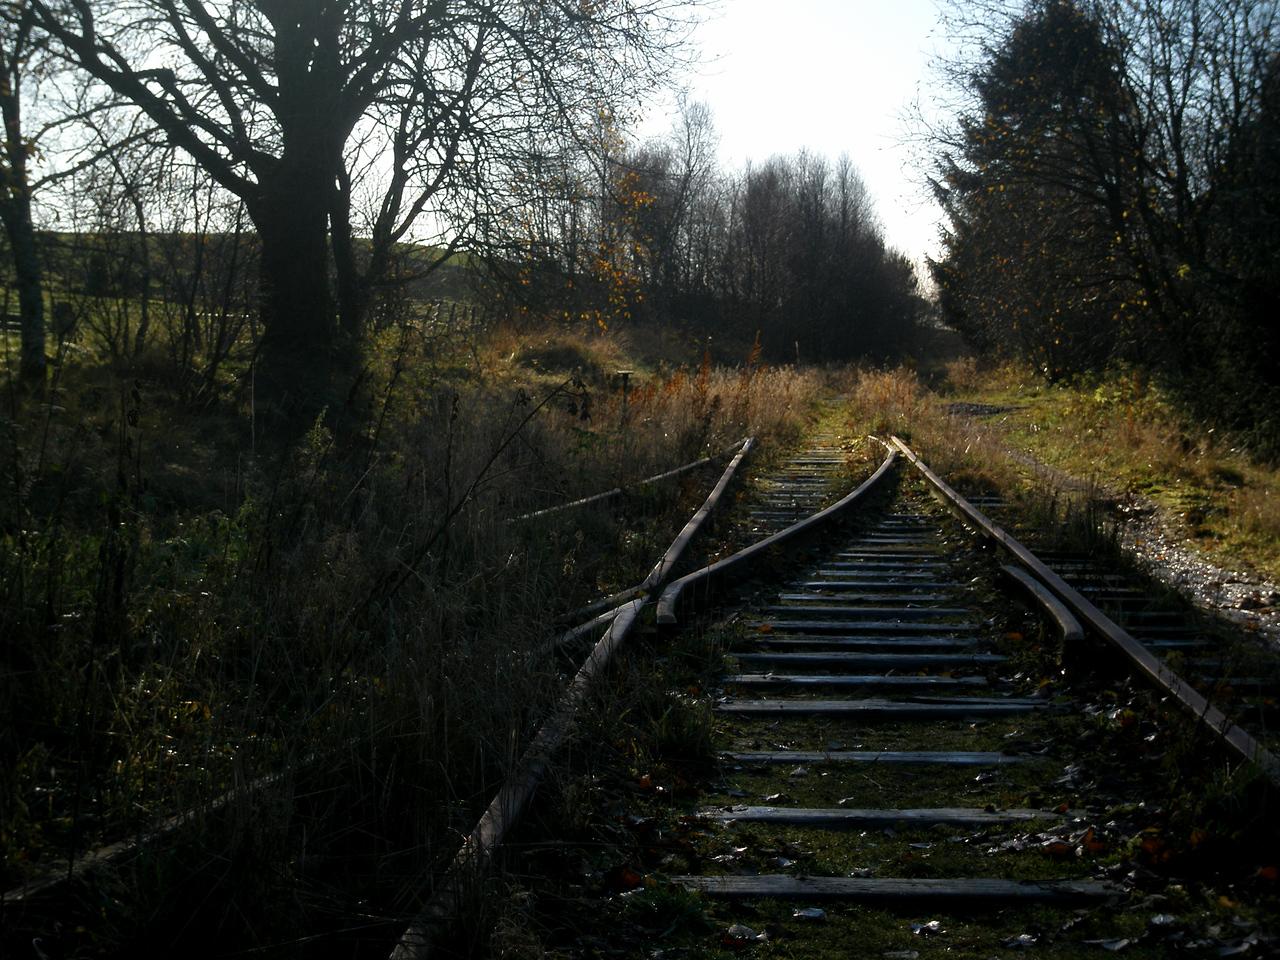 (Foto: Ståle)